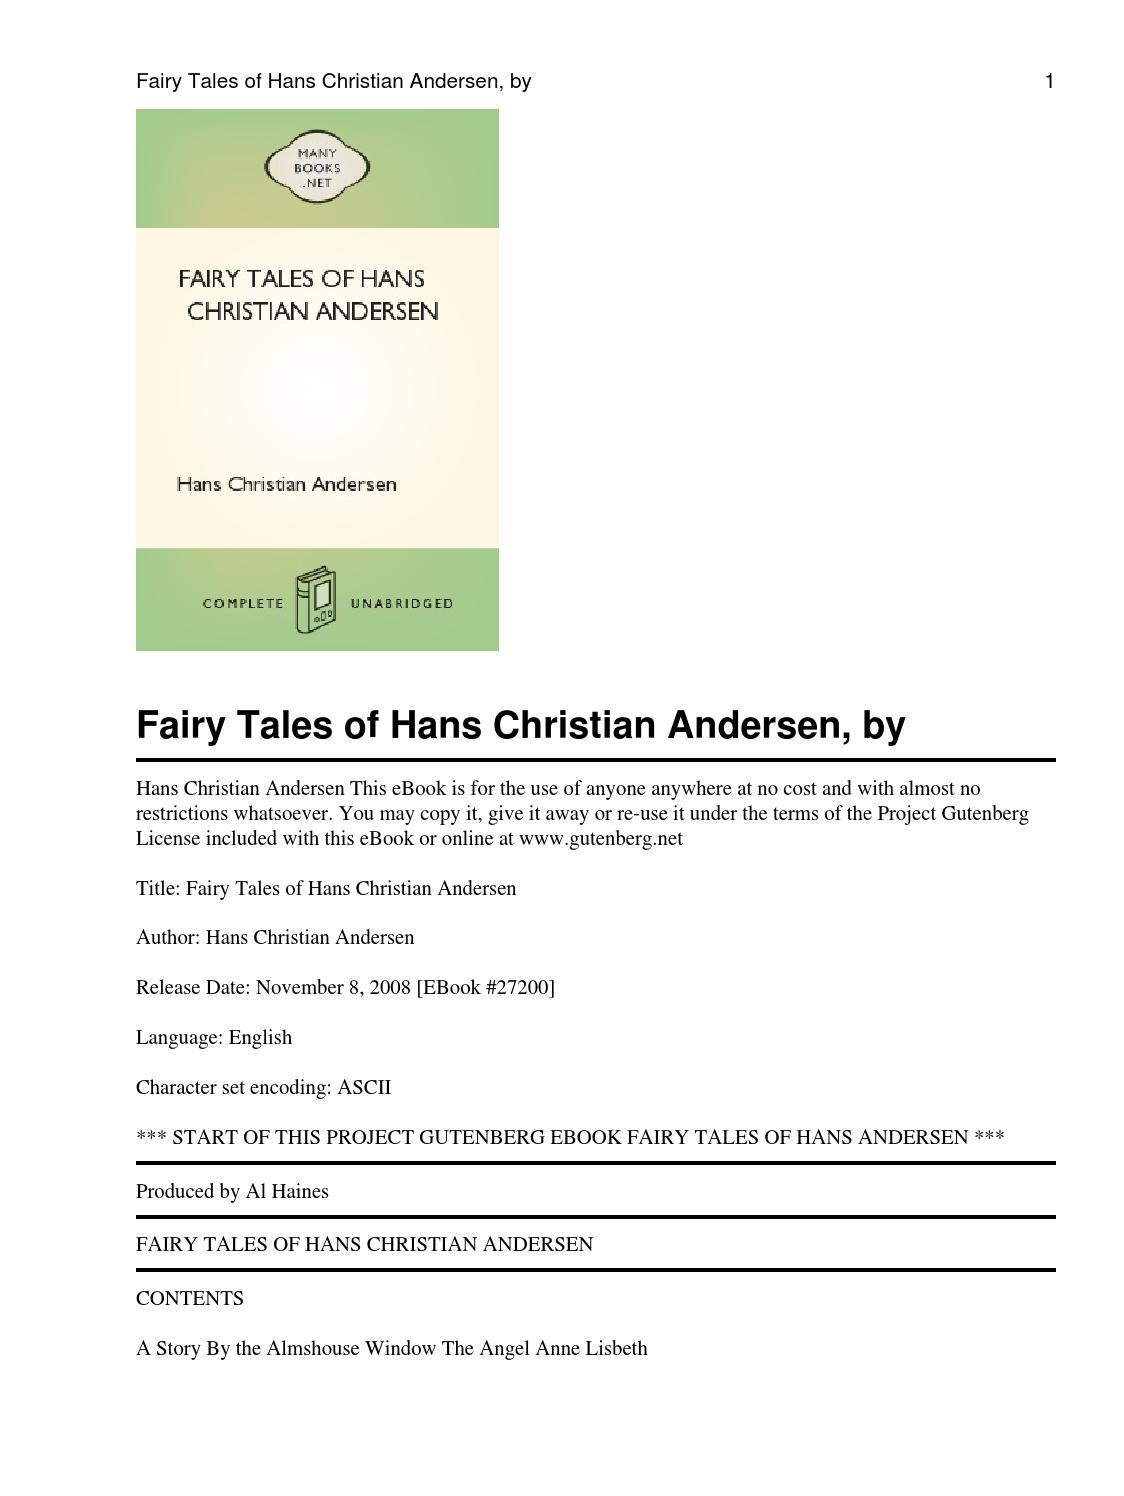 Fairy tales of hans christian andersen by yogh issuu fandeluxe Gallery